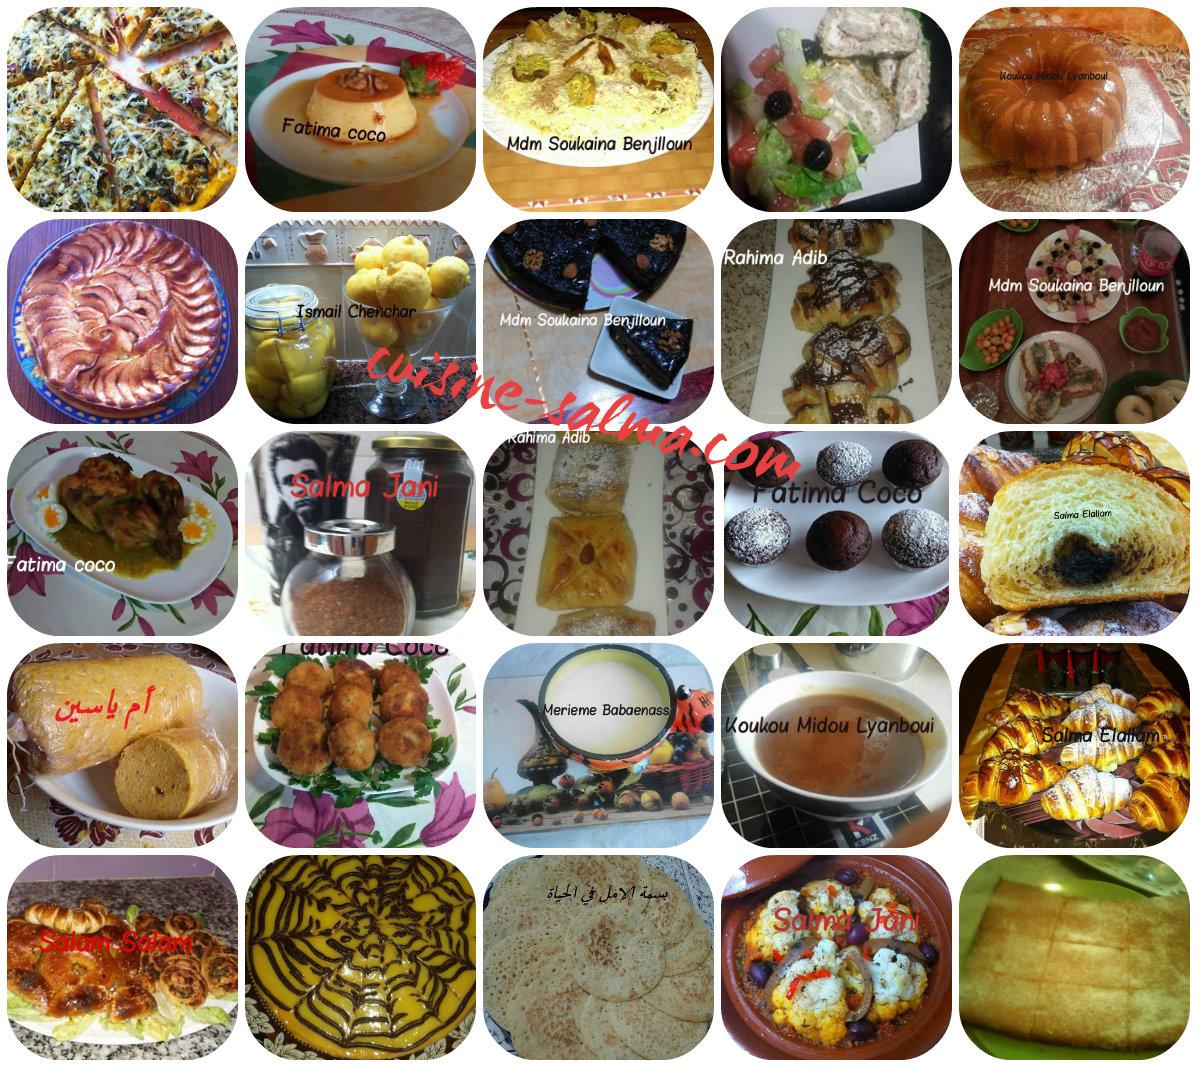 Recettes Testées Et Approuvées مجموعة من التجارب الناجحة مطبخ أم - Cuisine testee